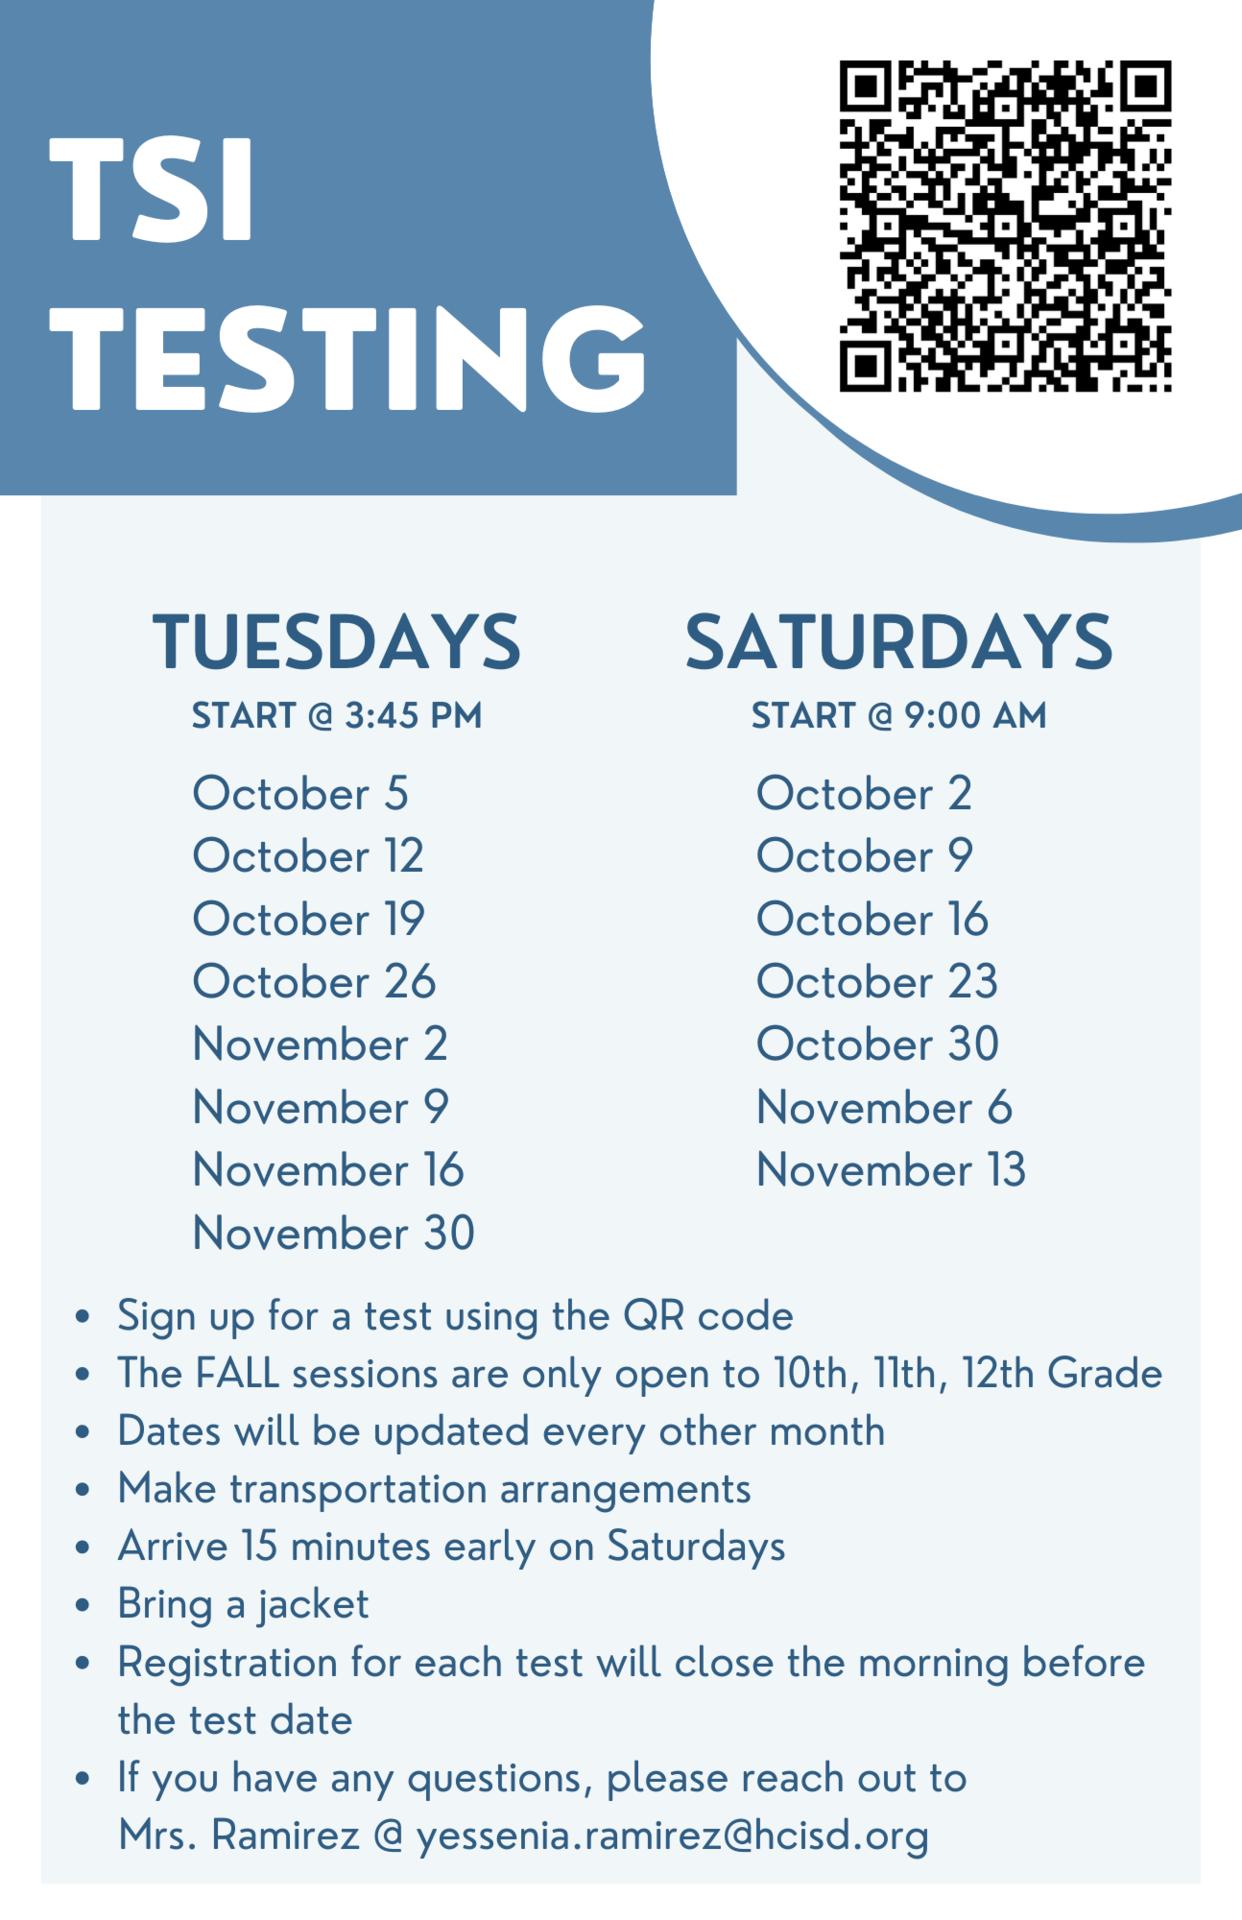 TSI Testing Flyer